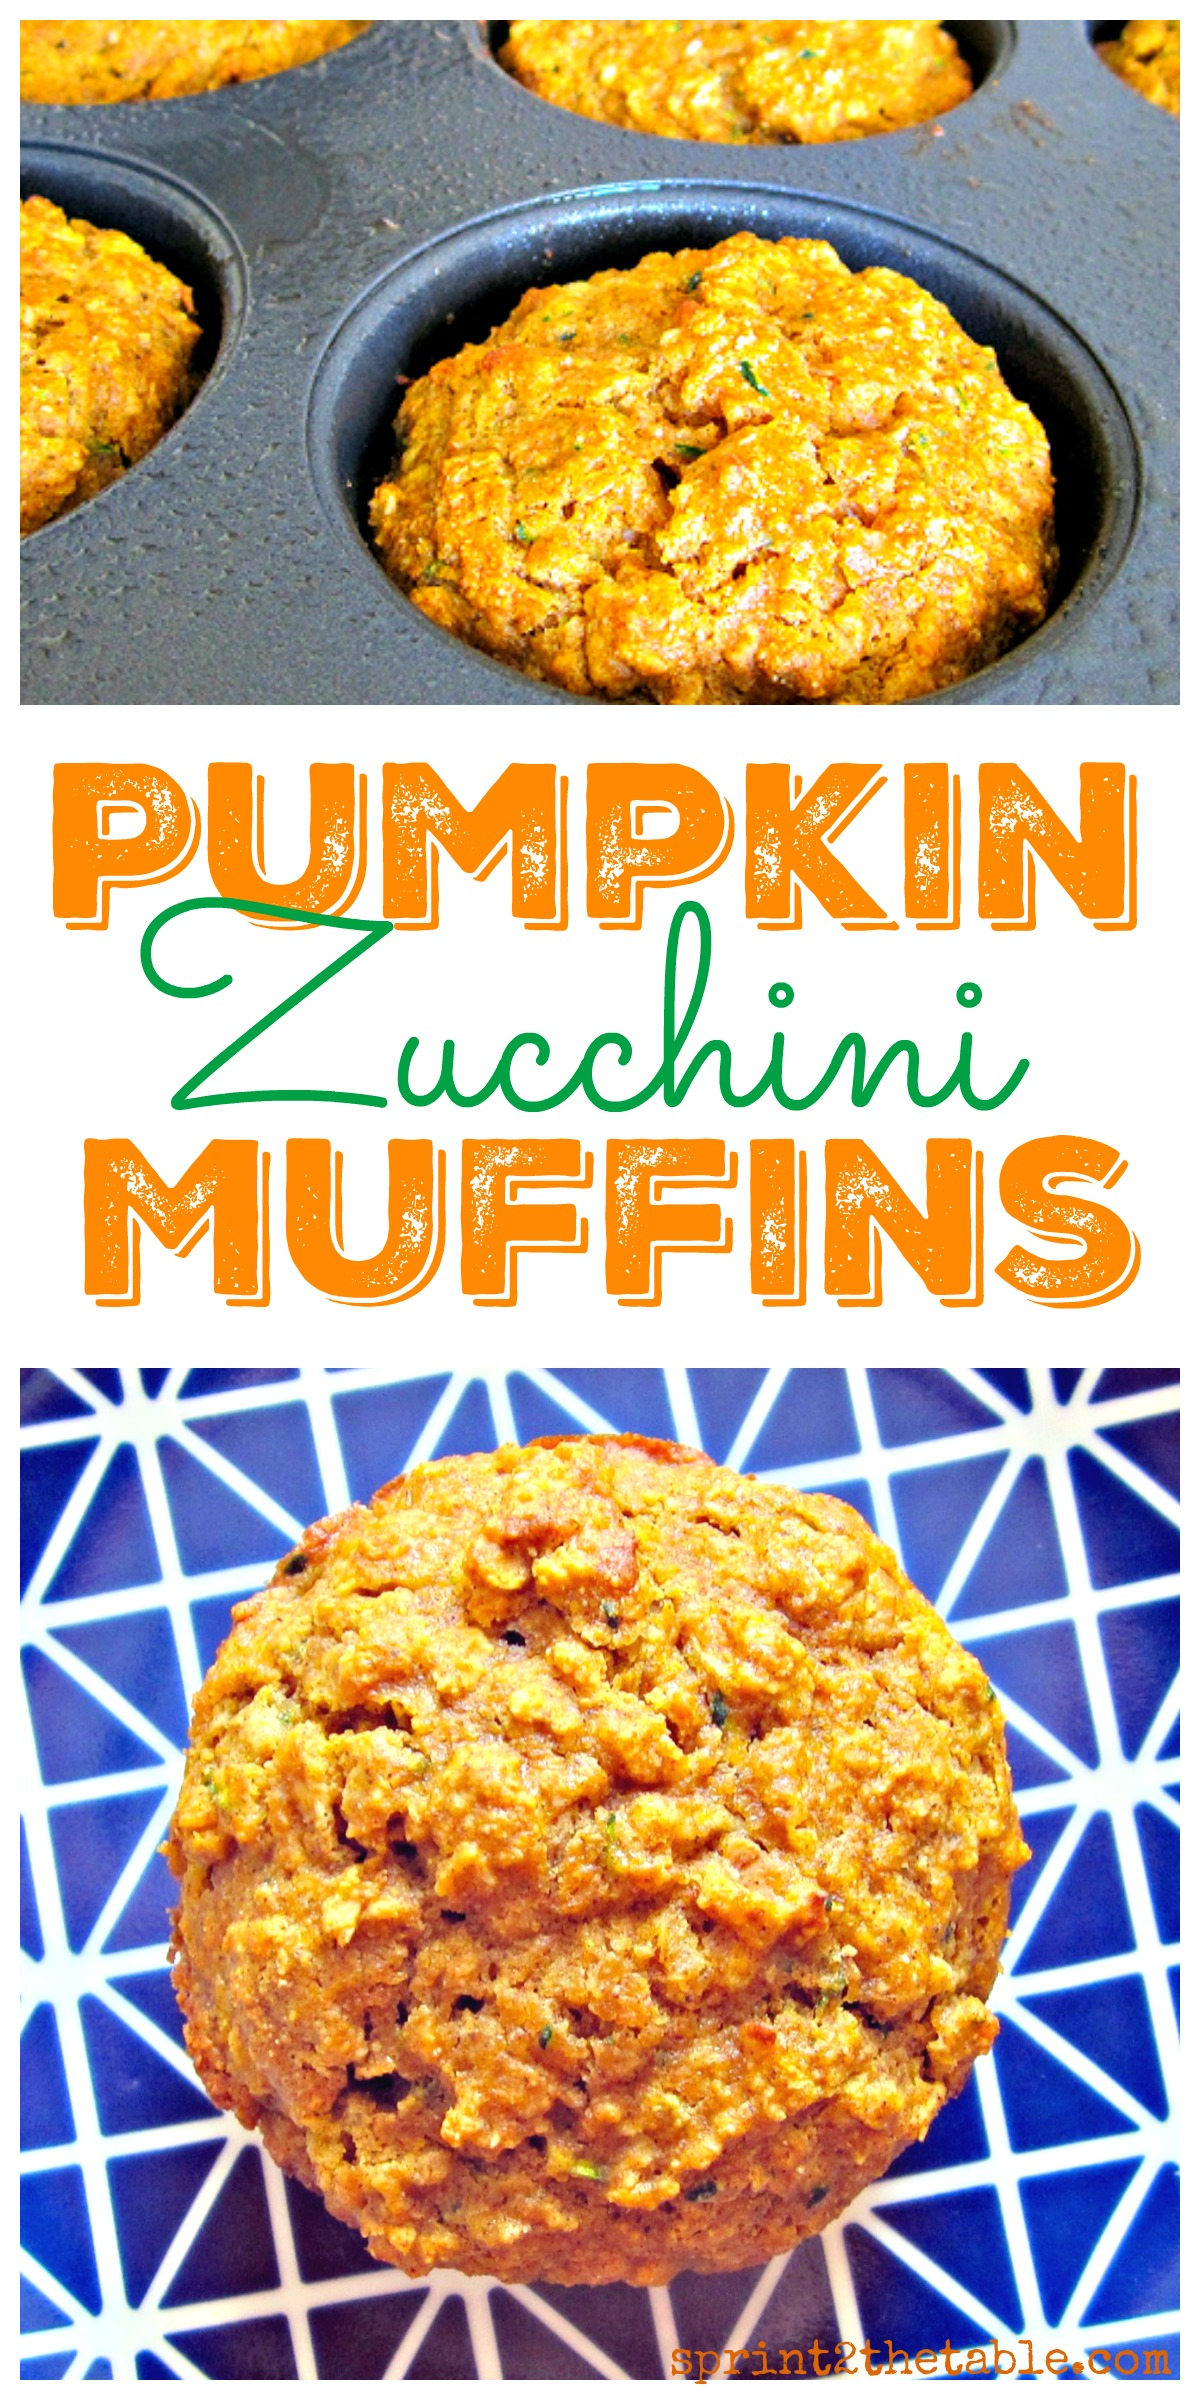 pumpkin-zucchini-muffins-healthy-fall-breakfast-that-wont-lead-to-a-sugar-crash